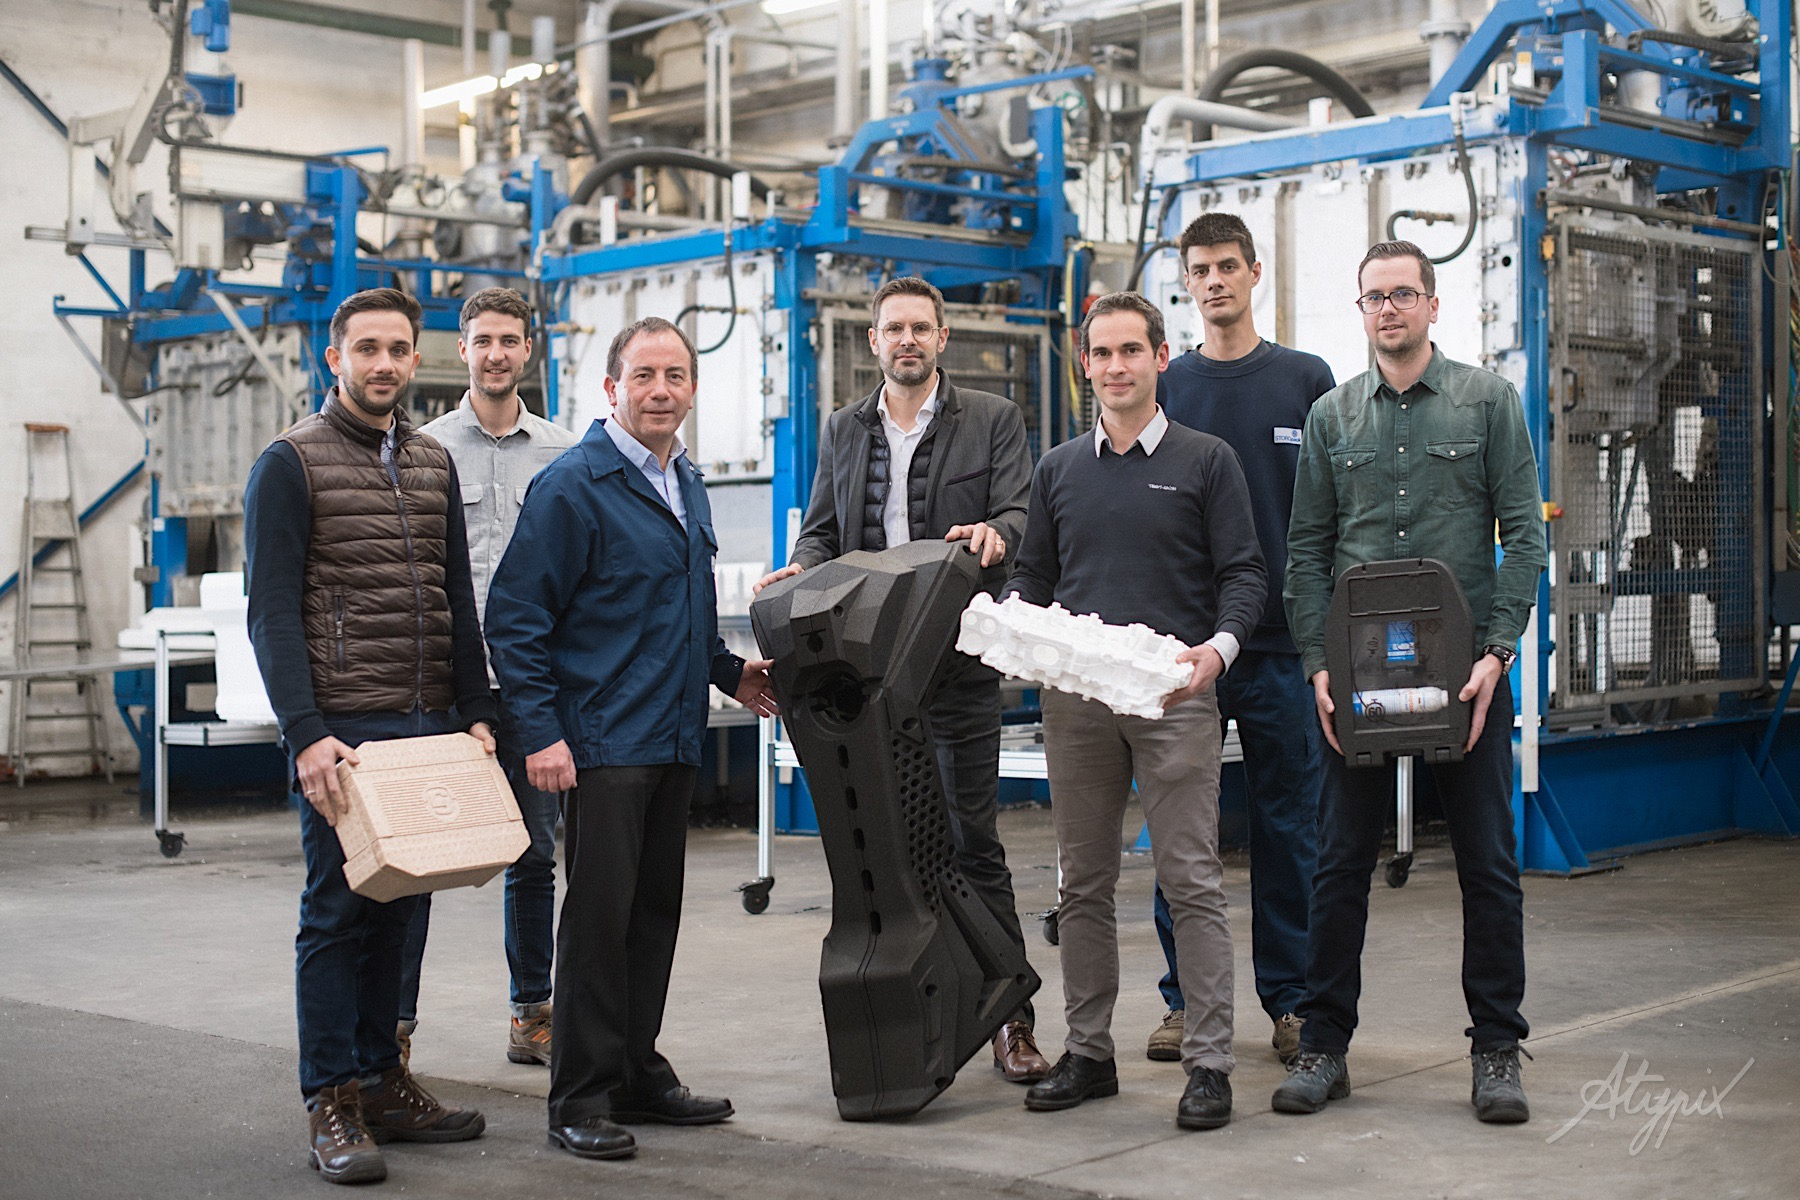 équipe R&D usine storopack nantes